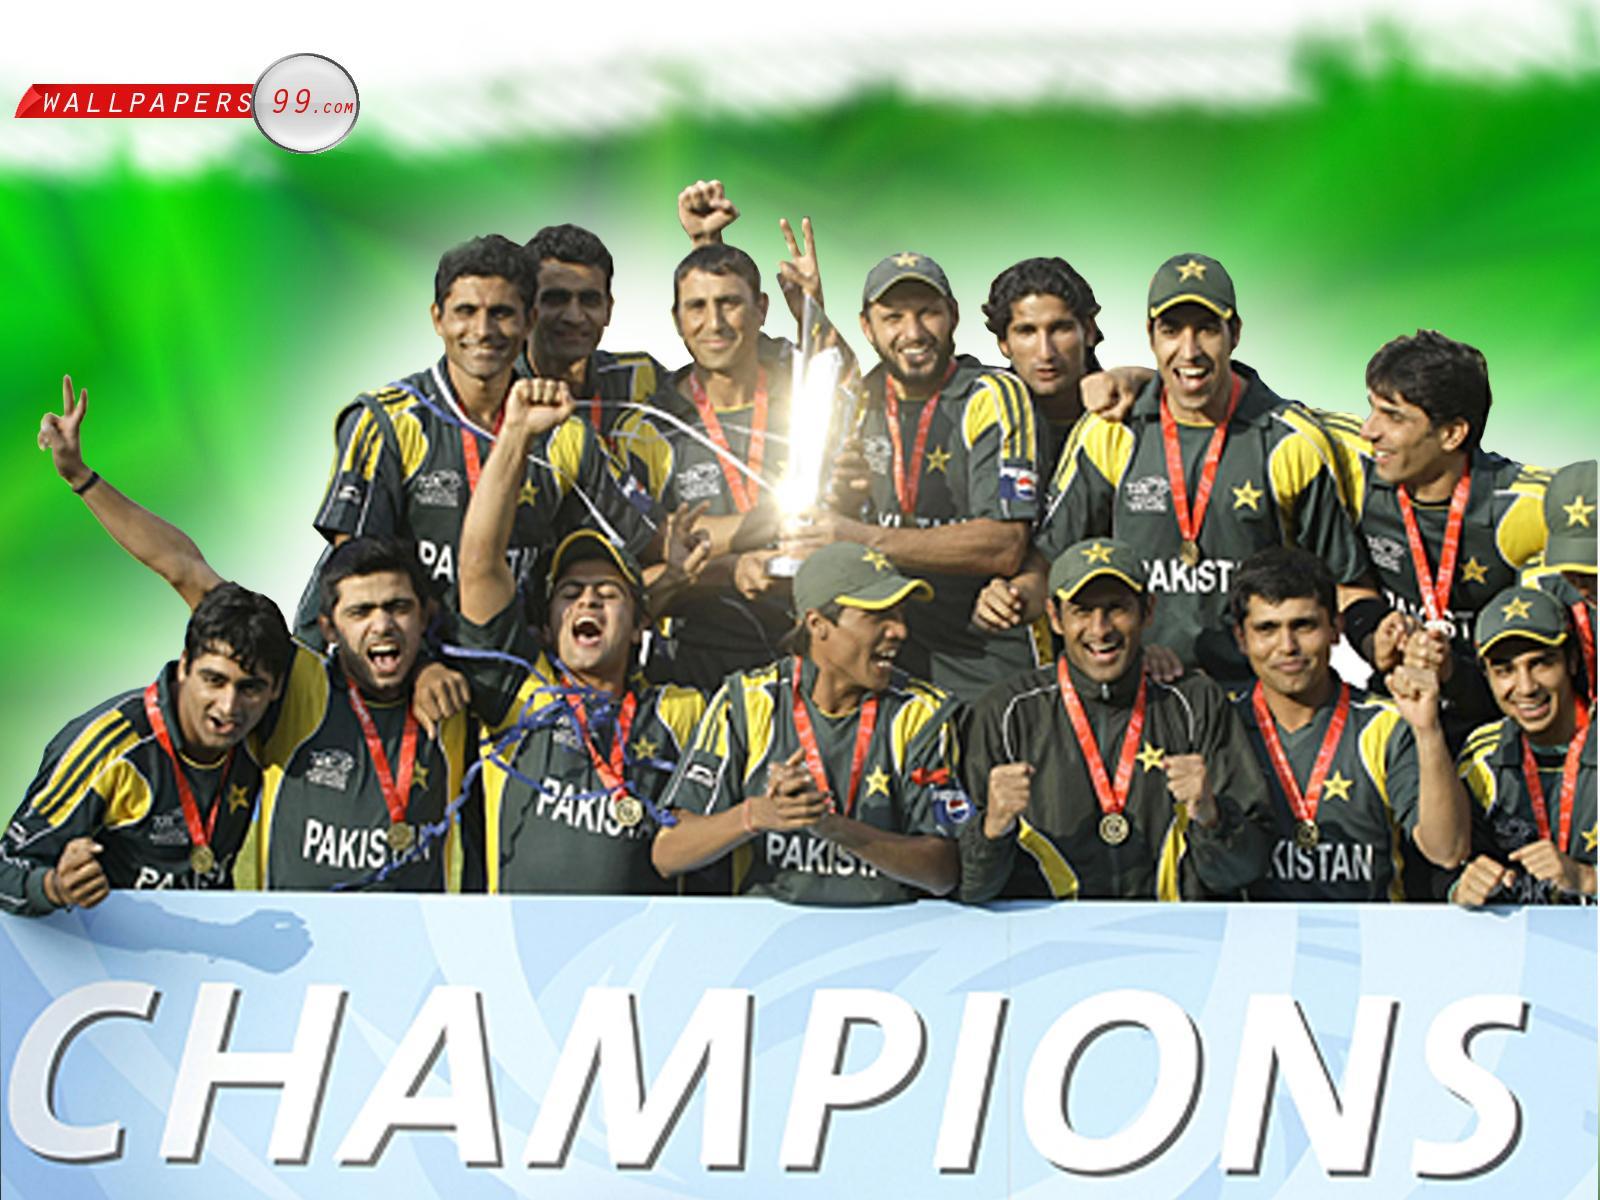 Celebrities fashion pakistan cricket team wallpapers - Pakistan cricket wallpapers hd ...